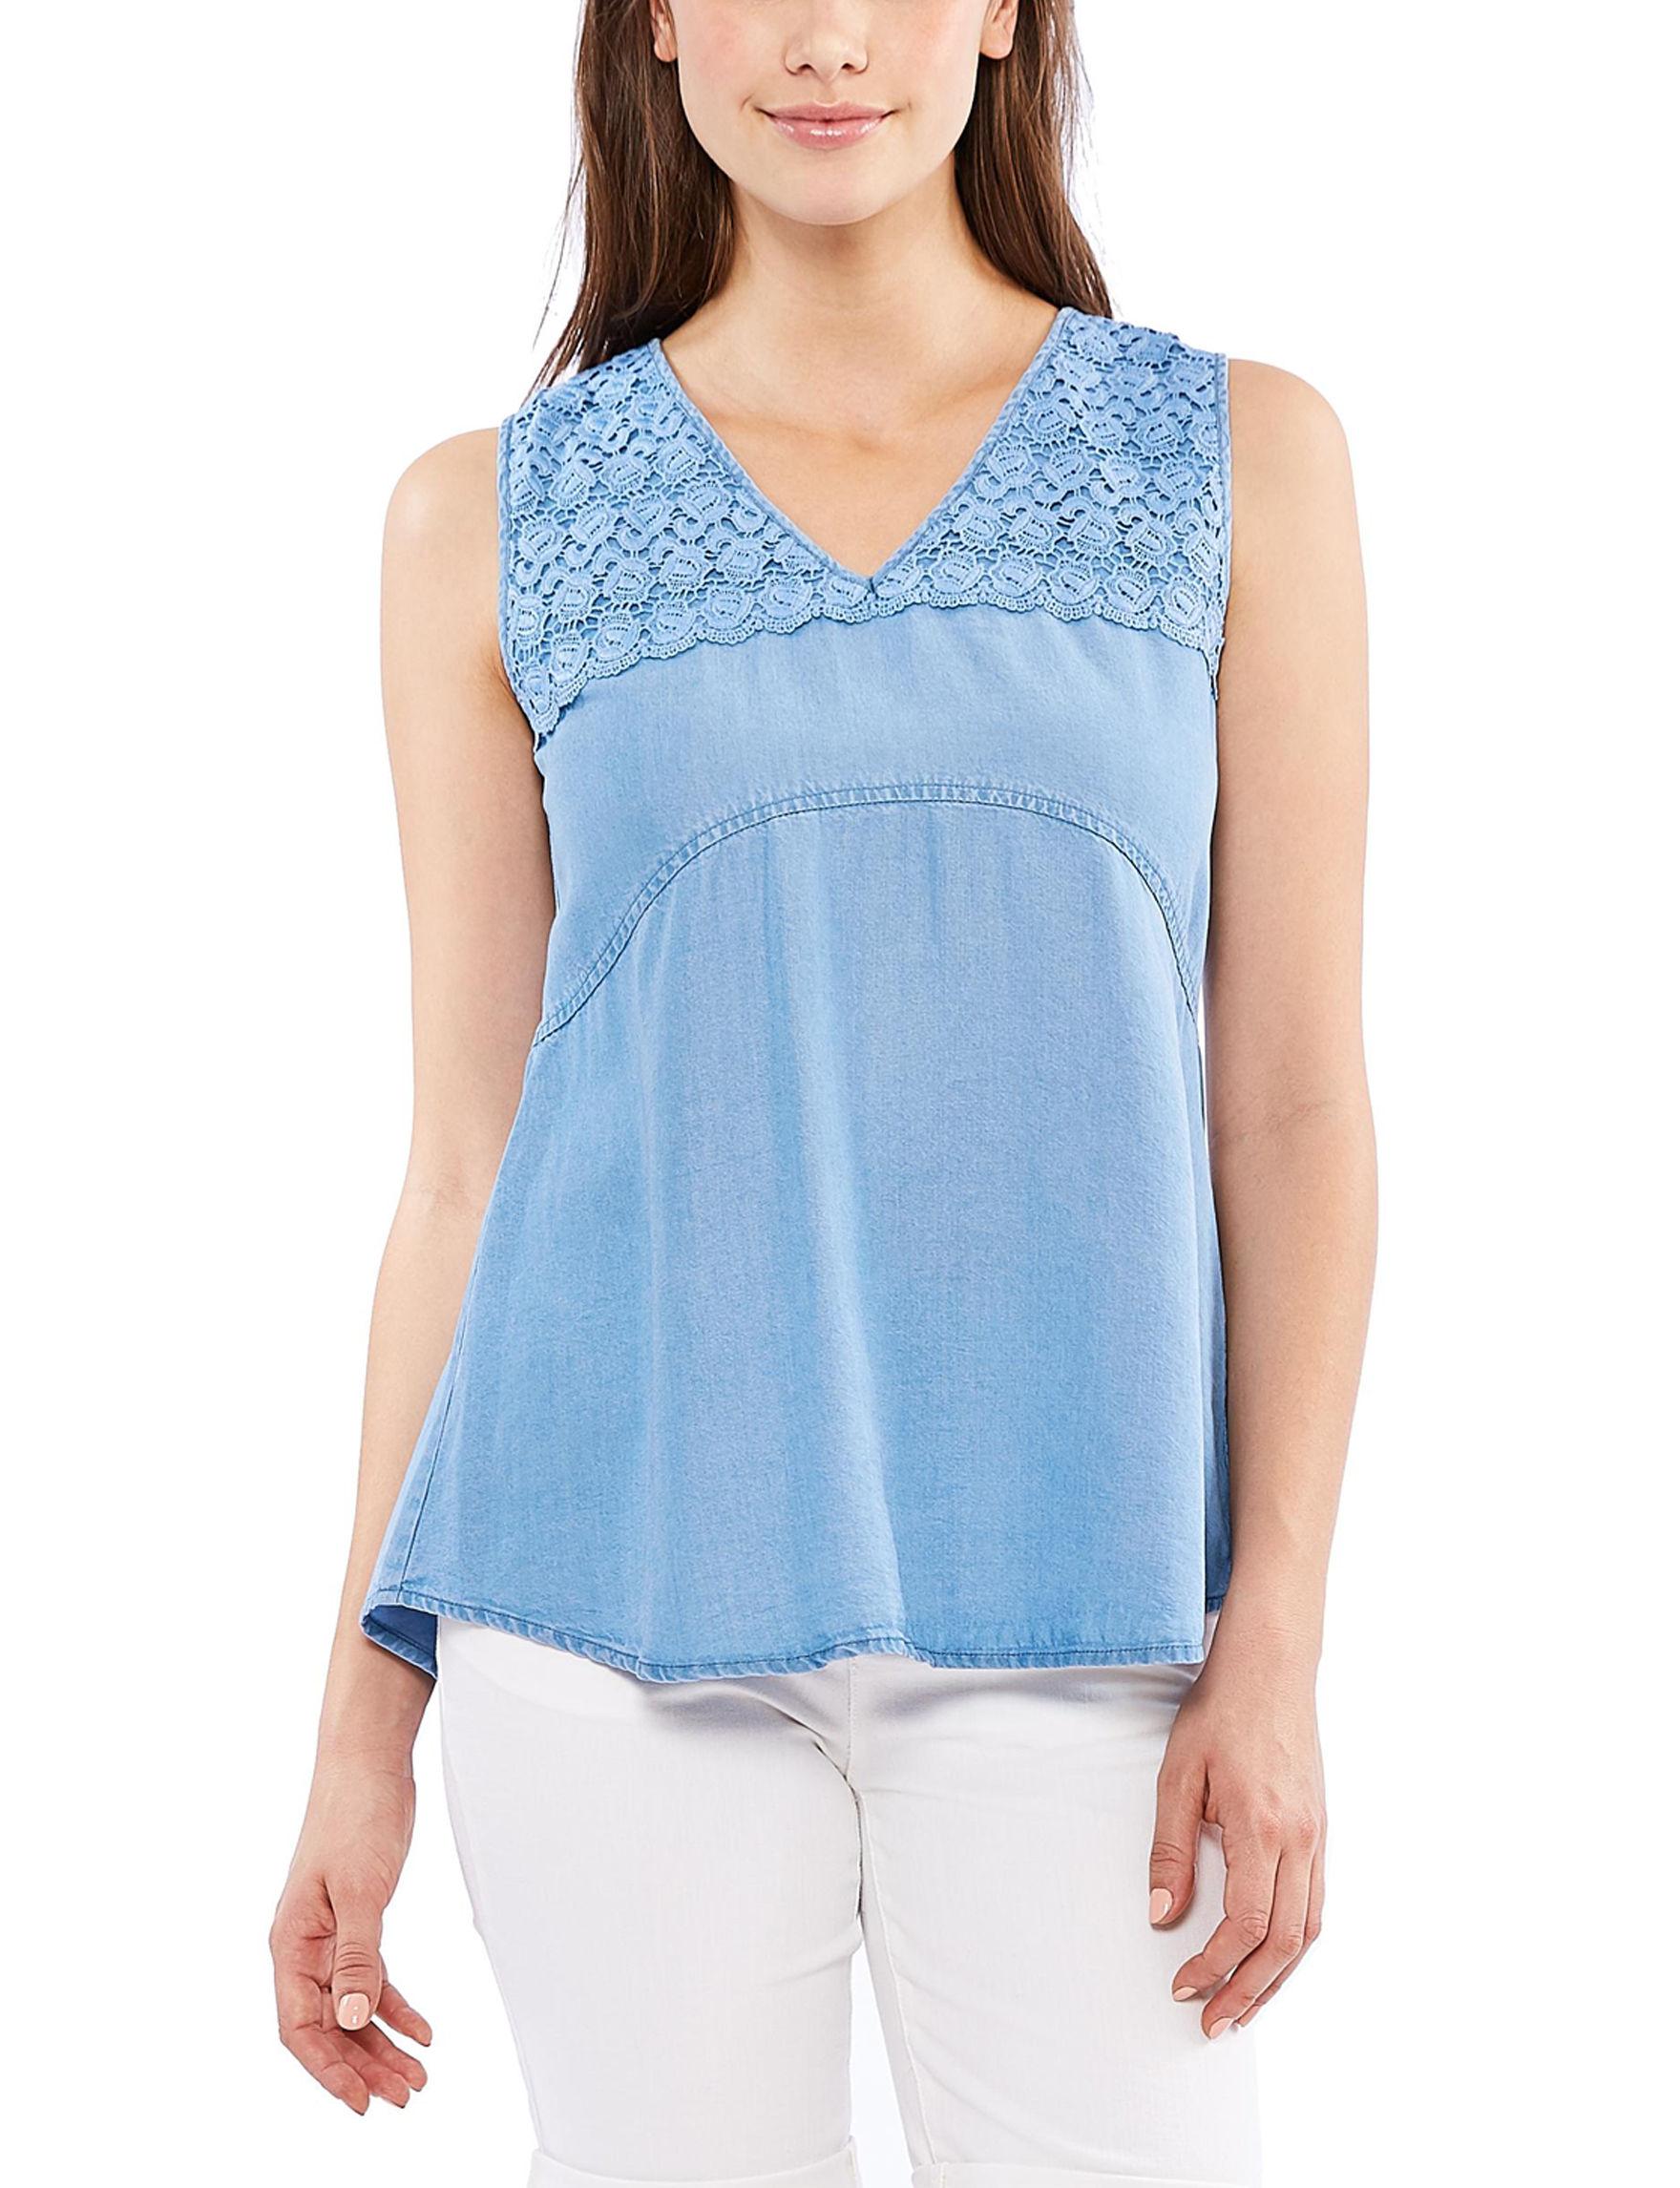 Skyes The Limit Denim Blue Shirts & Blouses